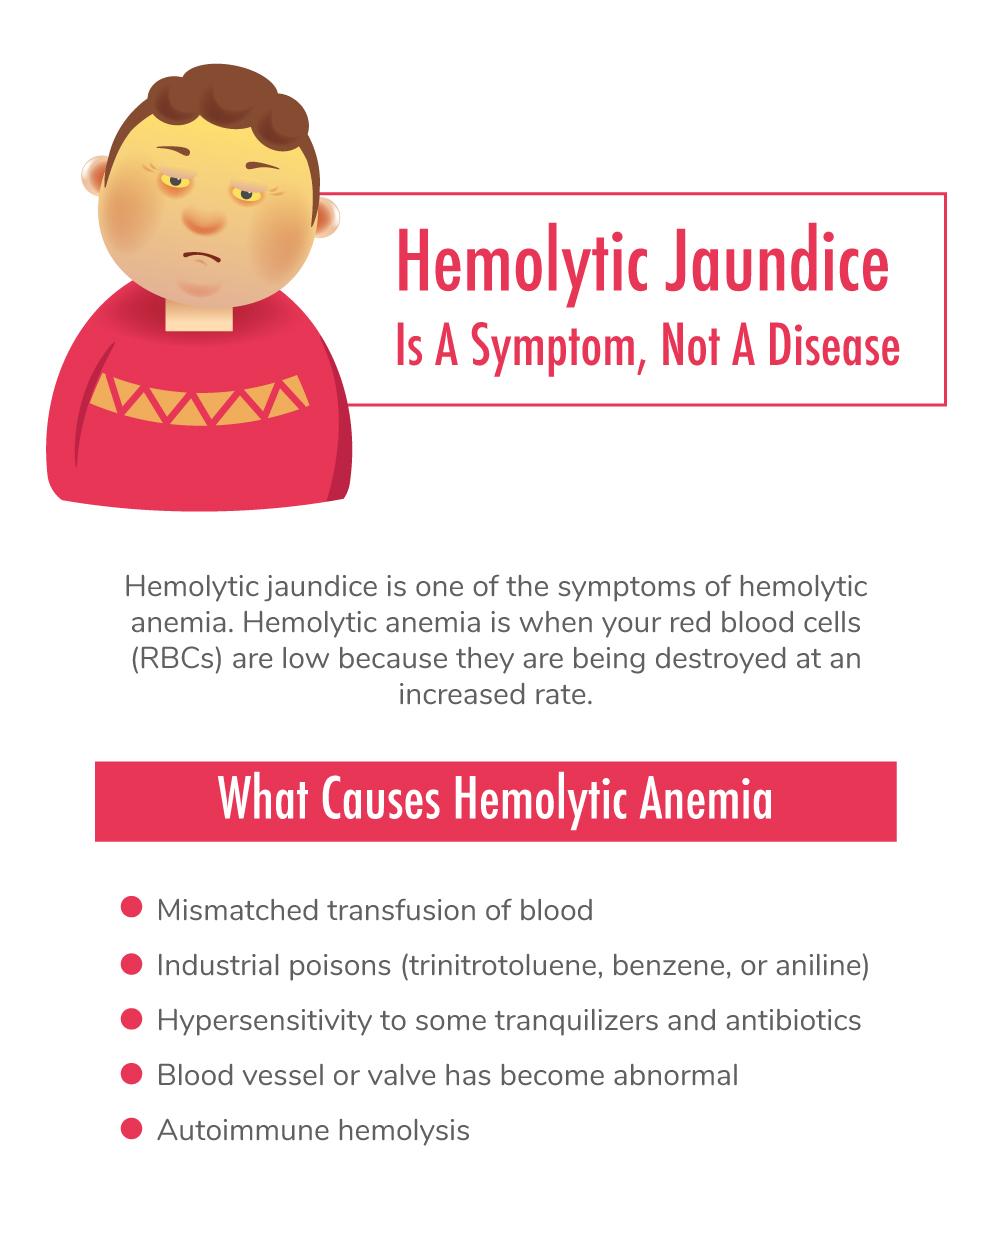 Hemolytic Jaundice Is A Symptom, Not A Disease